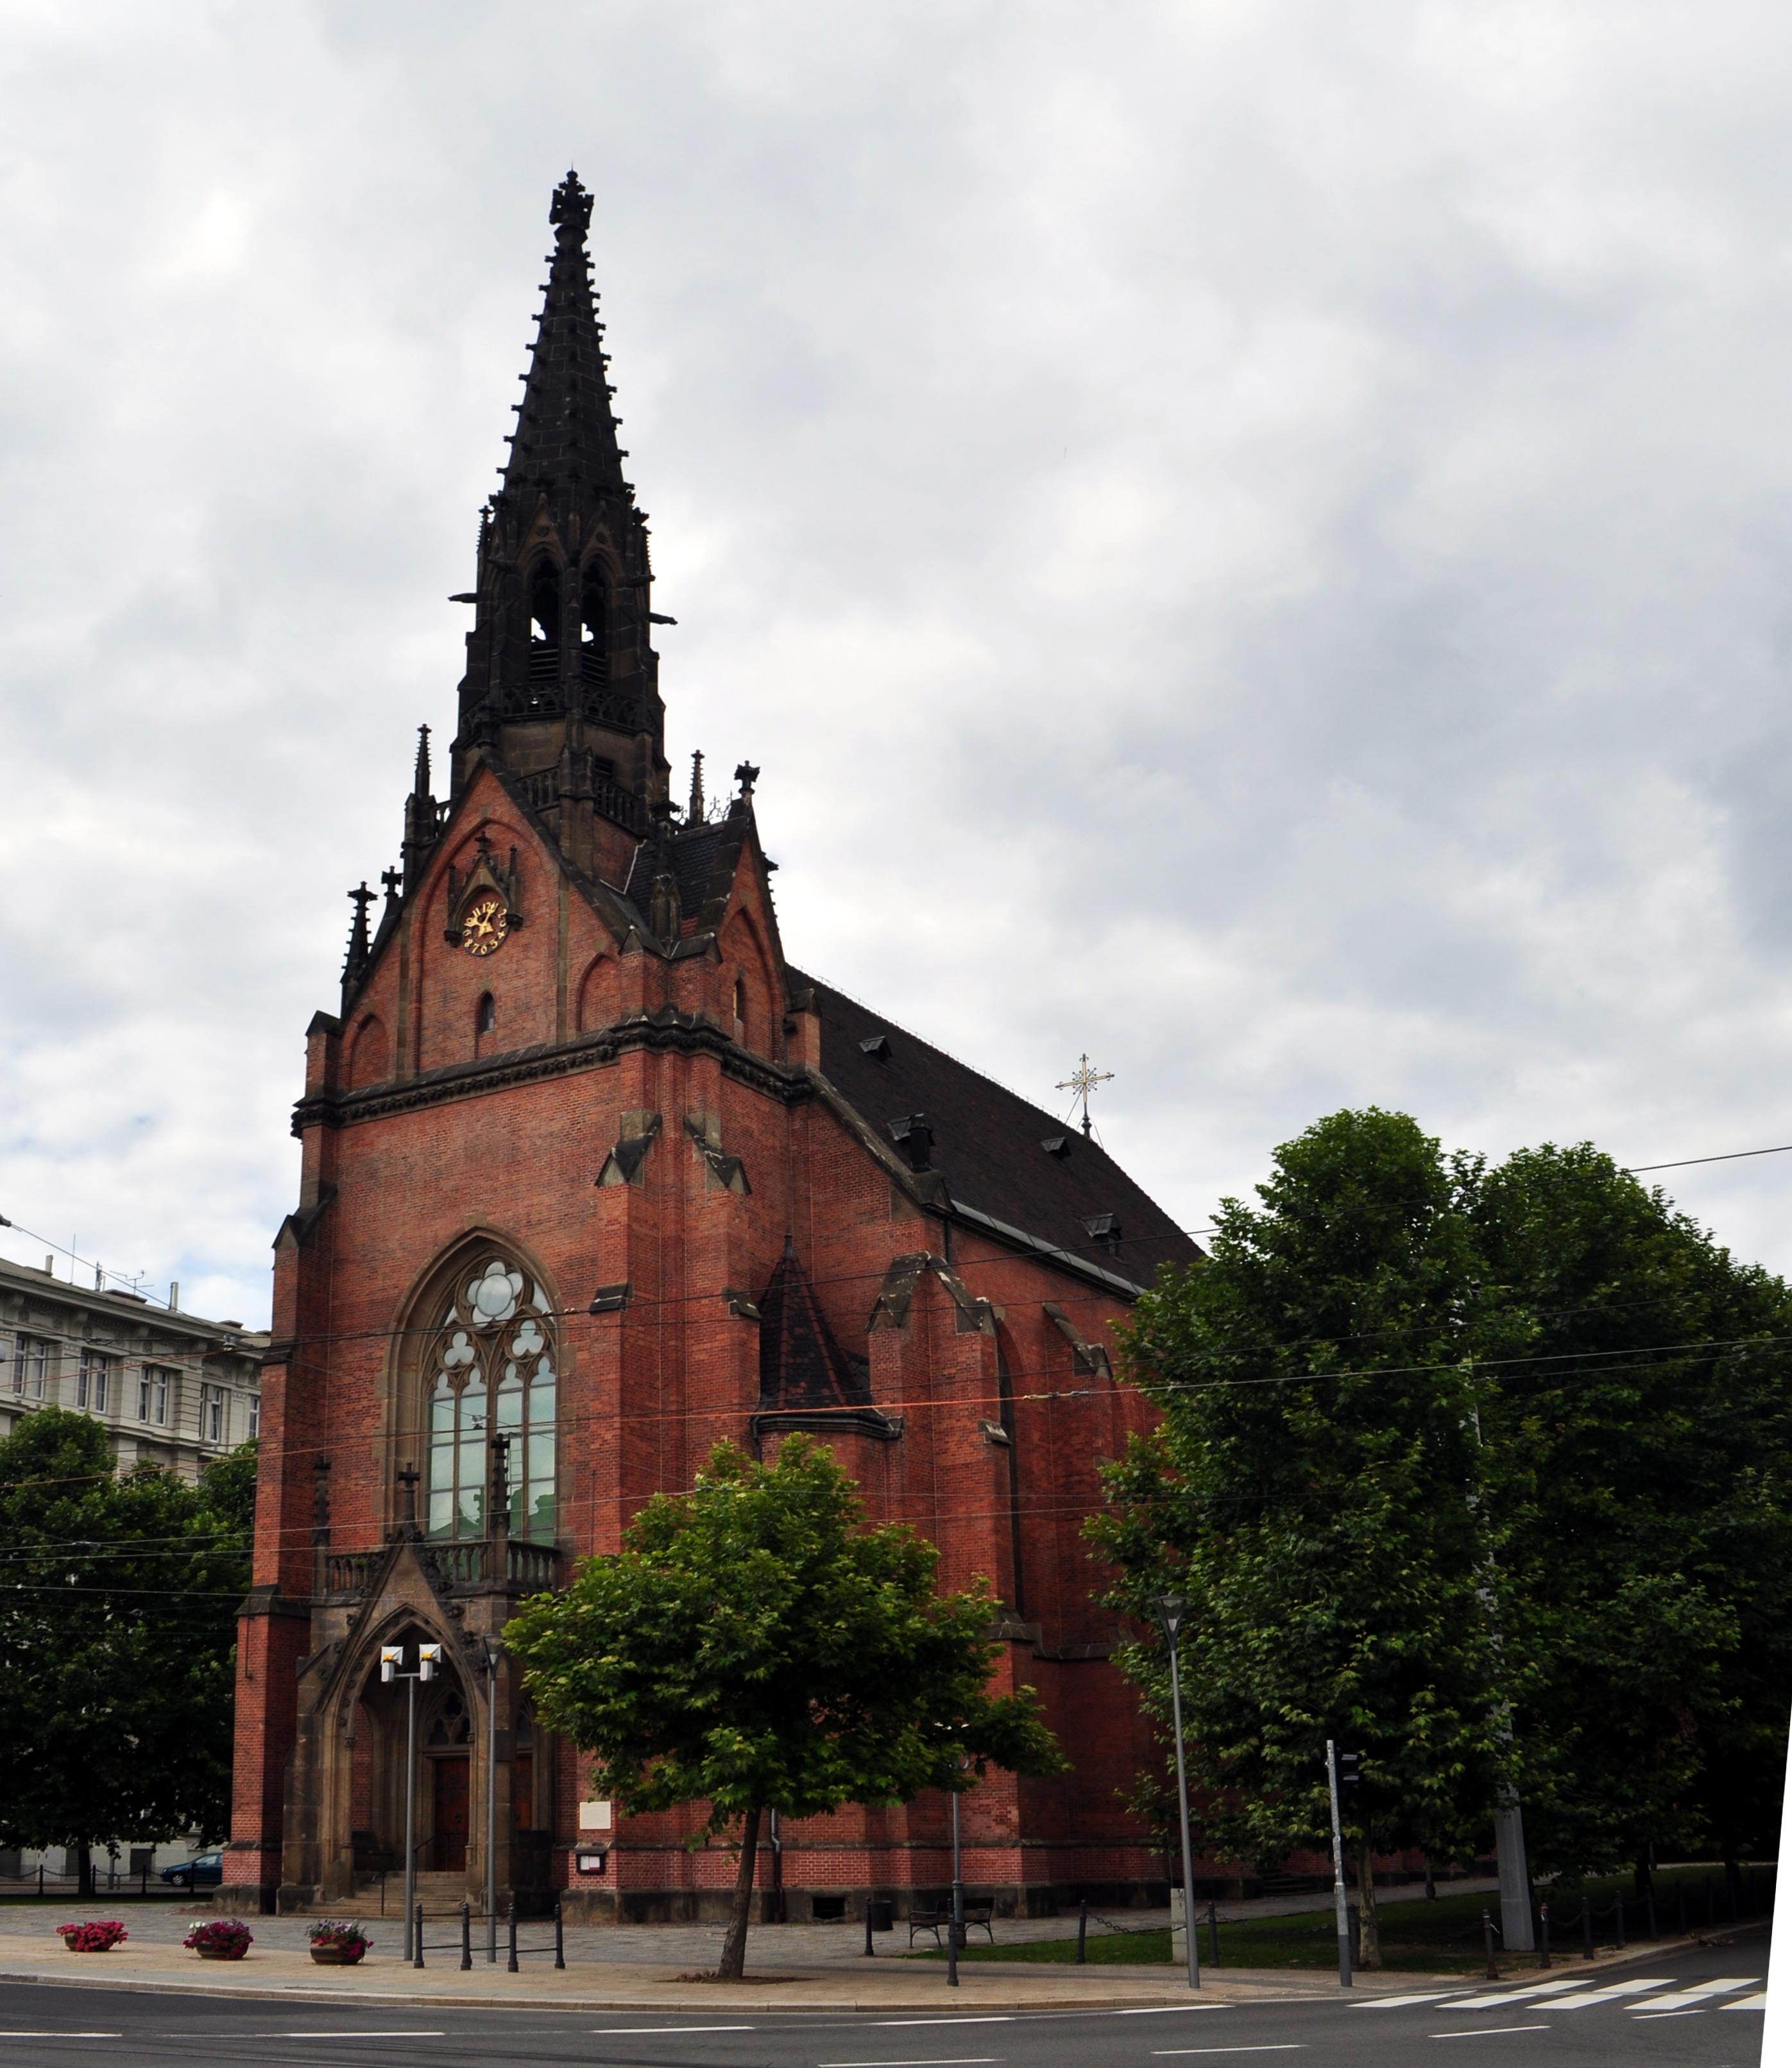 File:The Red church in Brno II.jpg - Wikimedia Commons